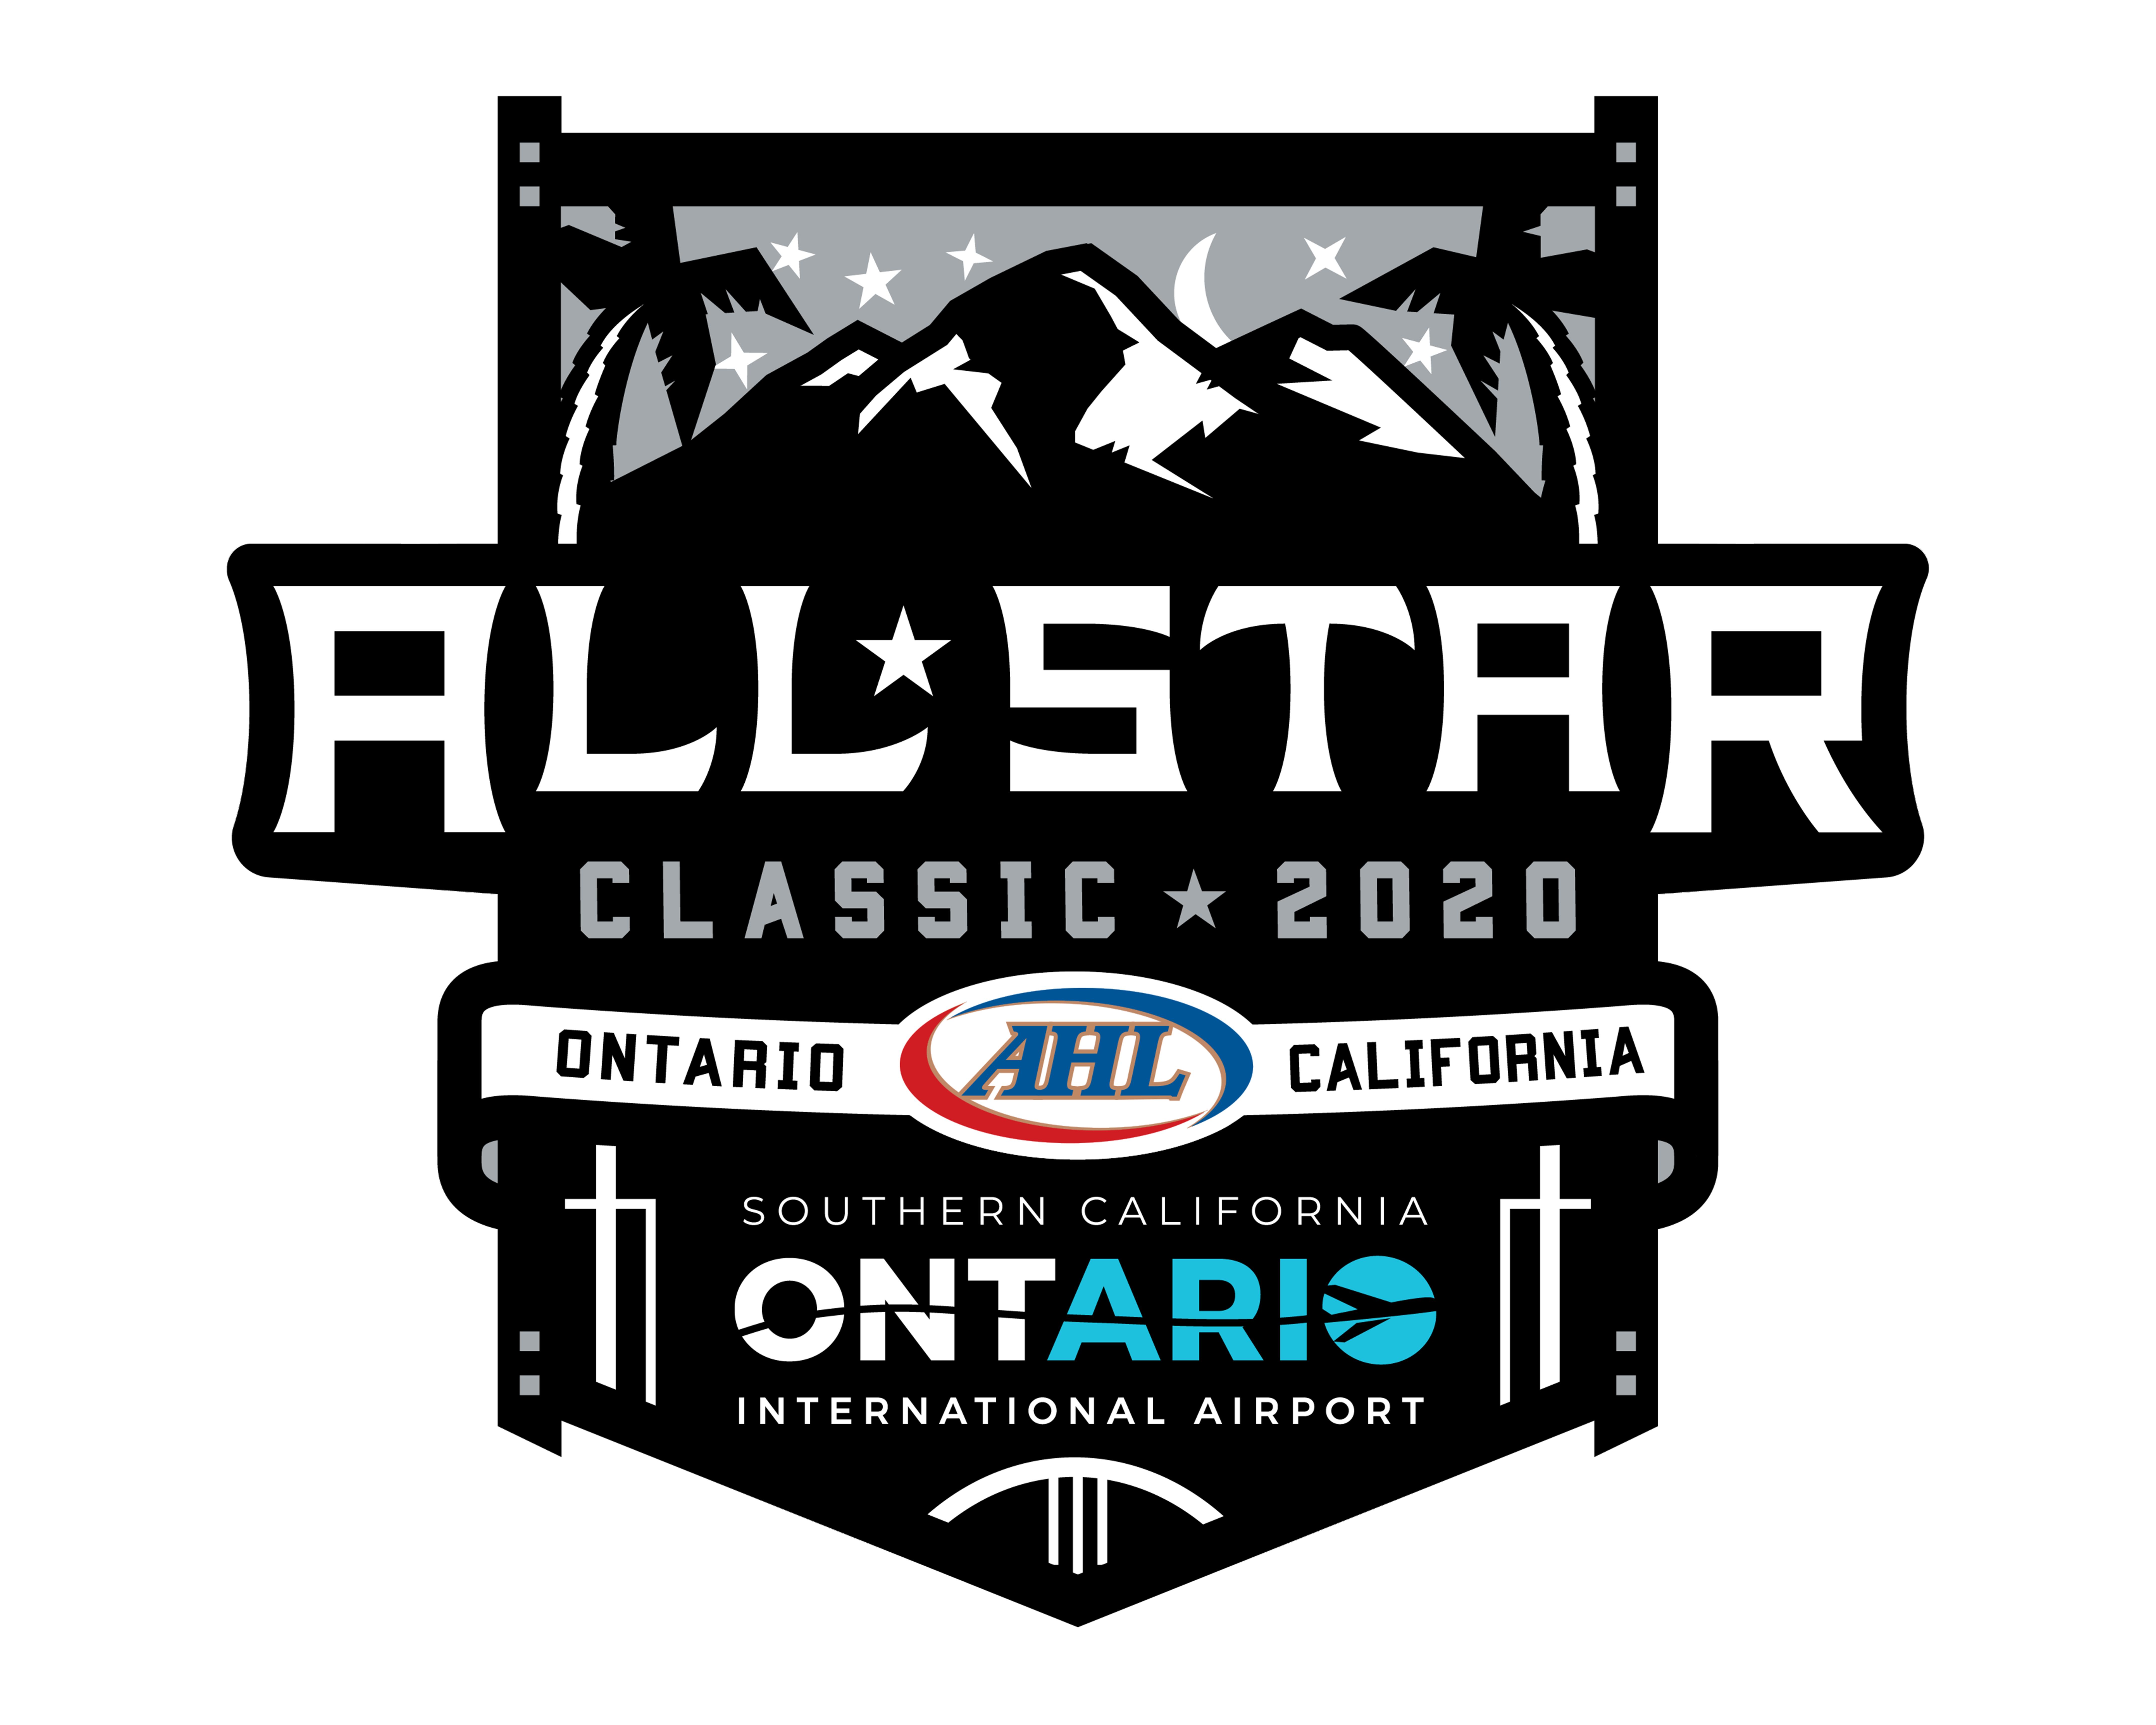 logotipo blanco de all star